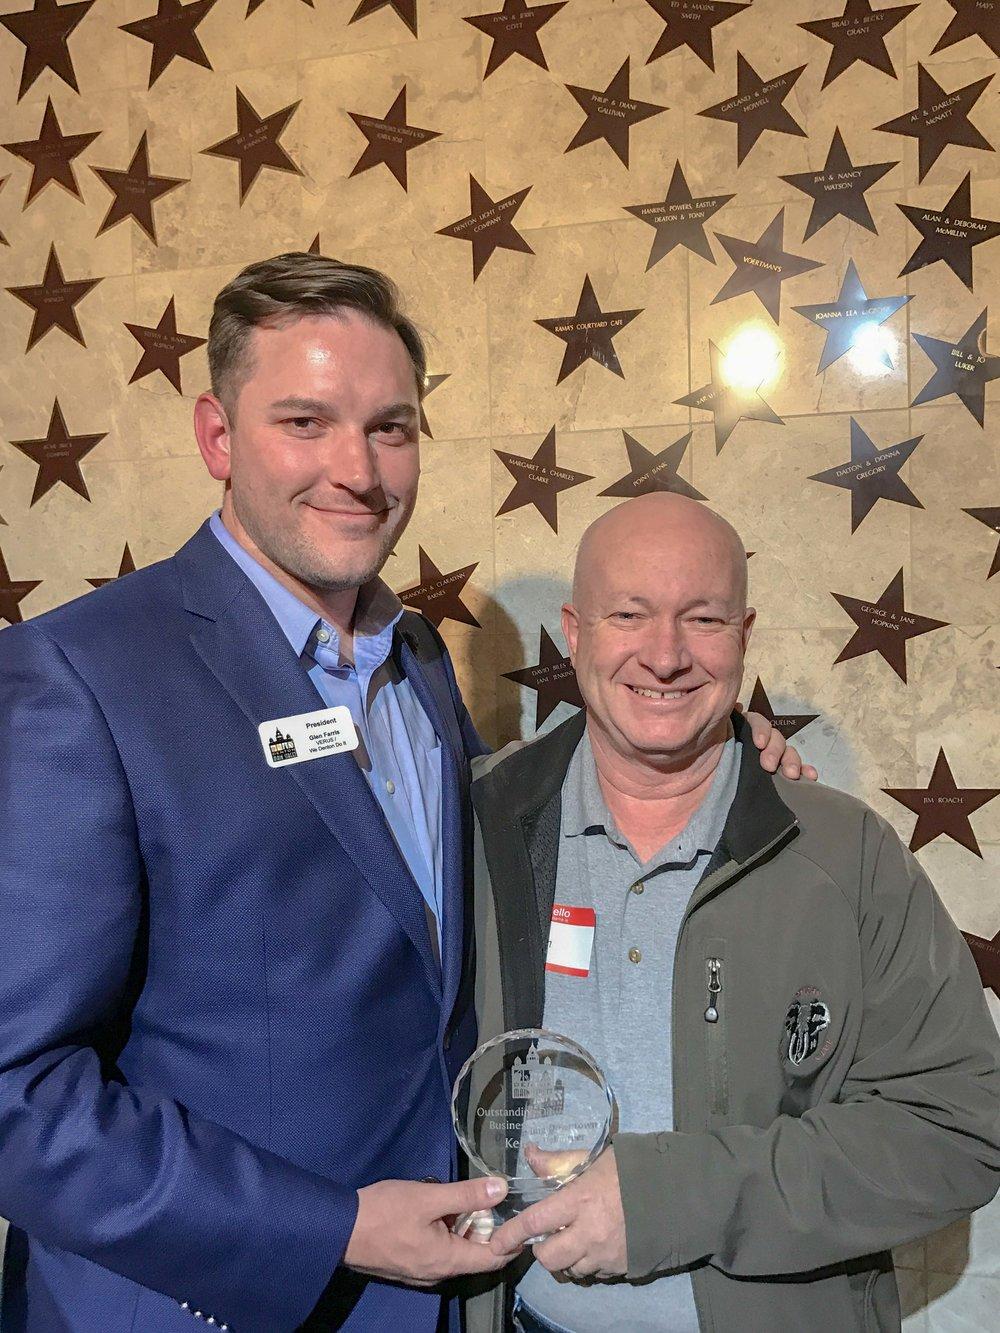 Current Denton MSA President Glen Farris with Outstanding Business Volunteer of the Year Award recipient, Ken Willis.